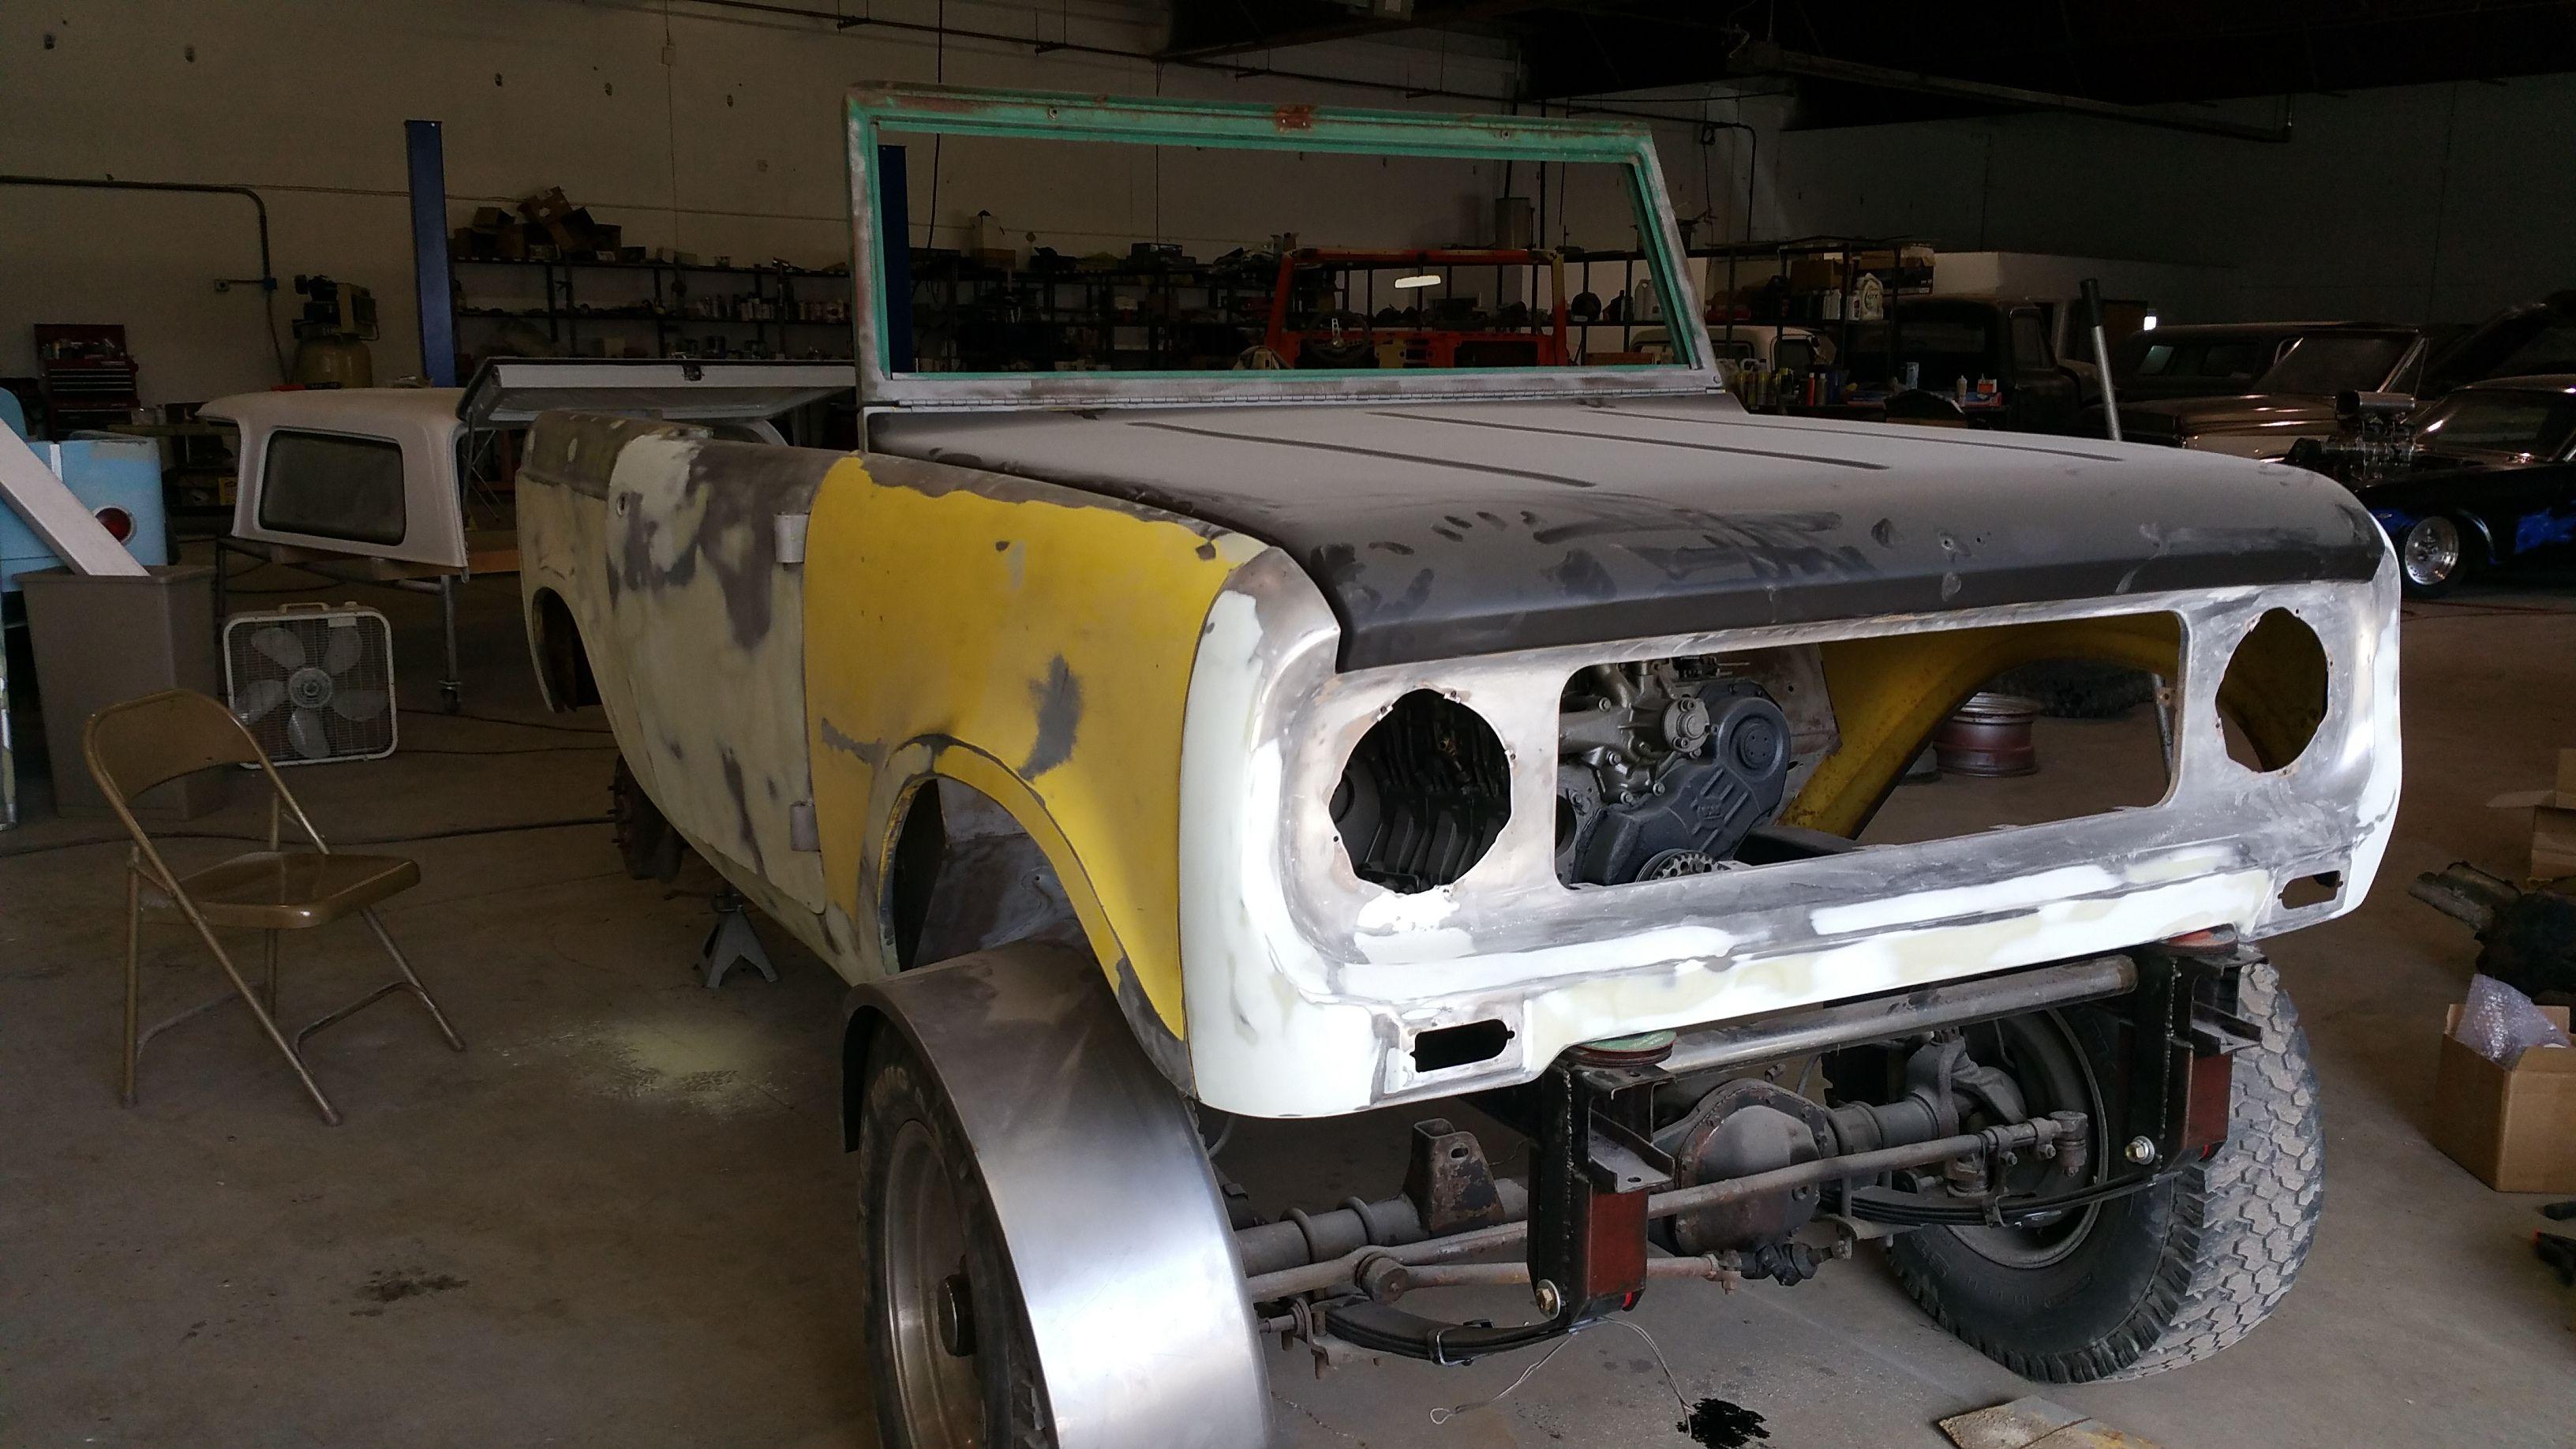 1966 IH Scout 80 Turbo Diesel fab work. Had to mock up